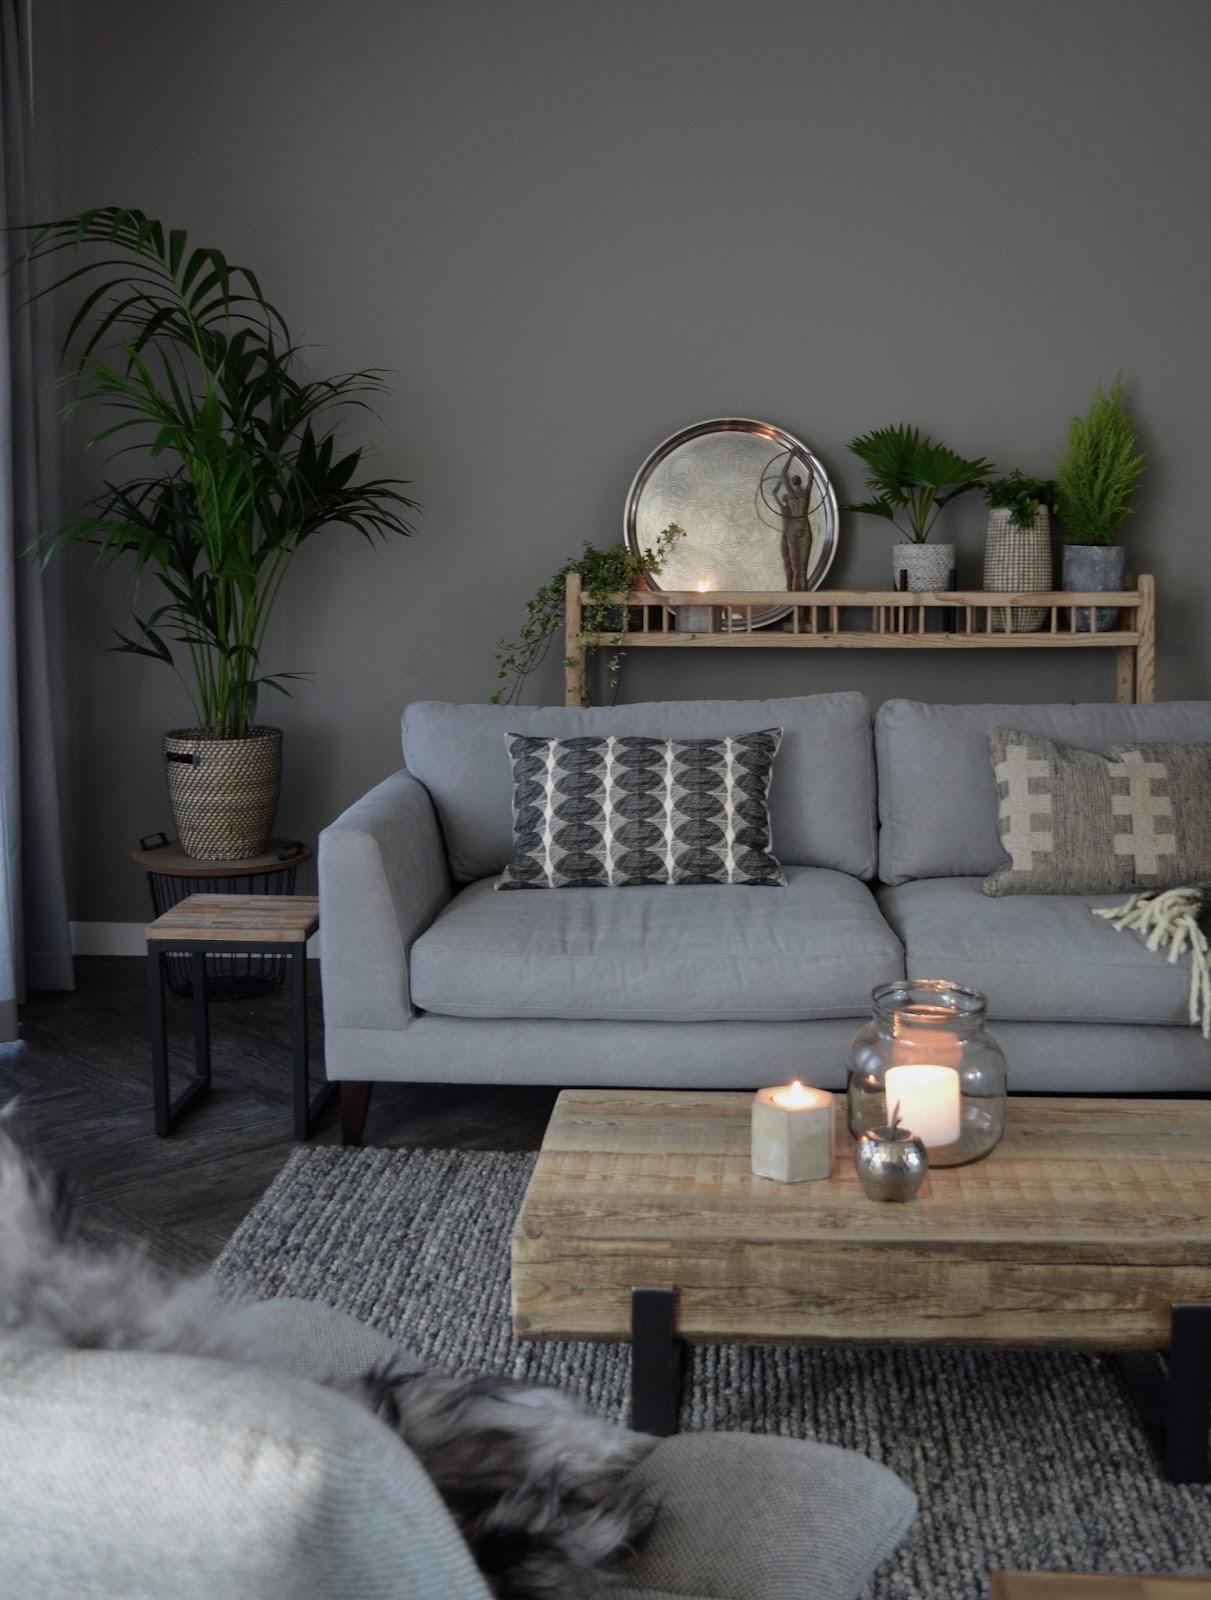 Interieur & styling in dalfsen: de woonkamer